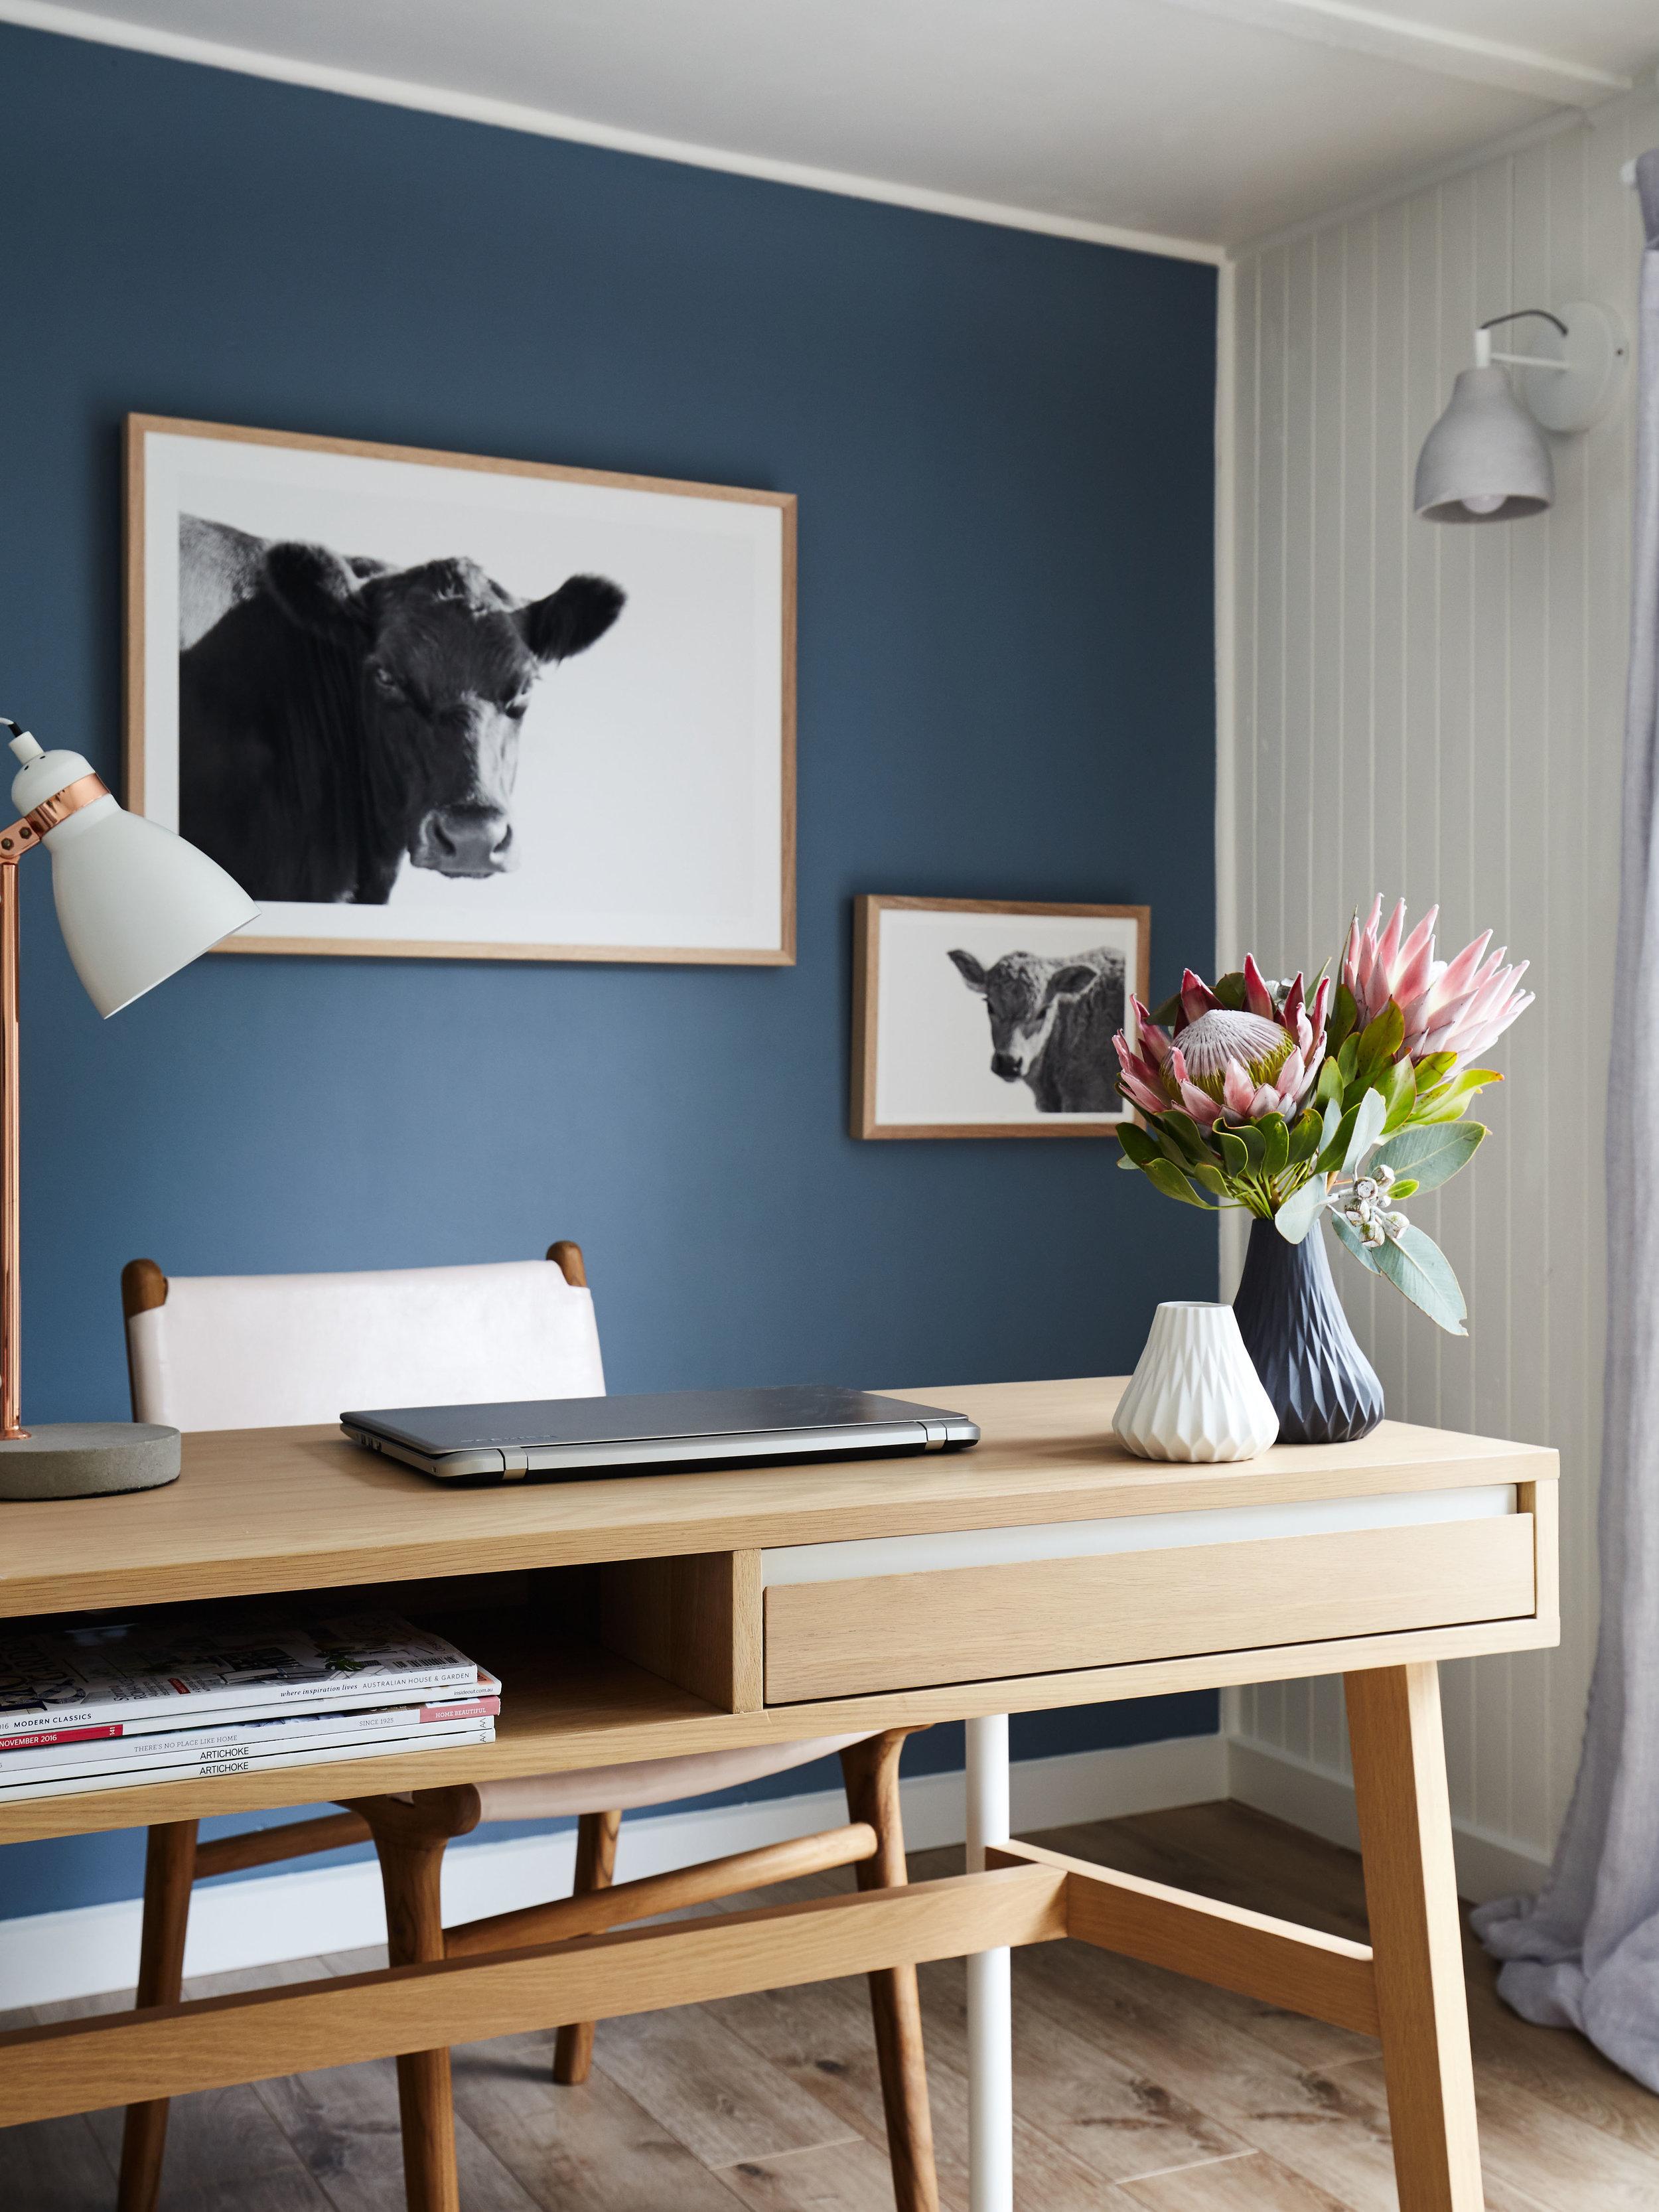 Maitland Street Interiors, Sarah Elshaug, Elsie + Hugo, The MSI Studio, Photographic Artist, Cow Prints